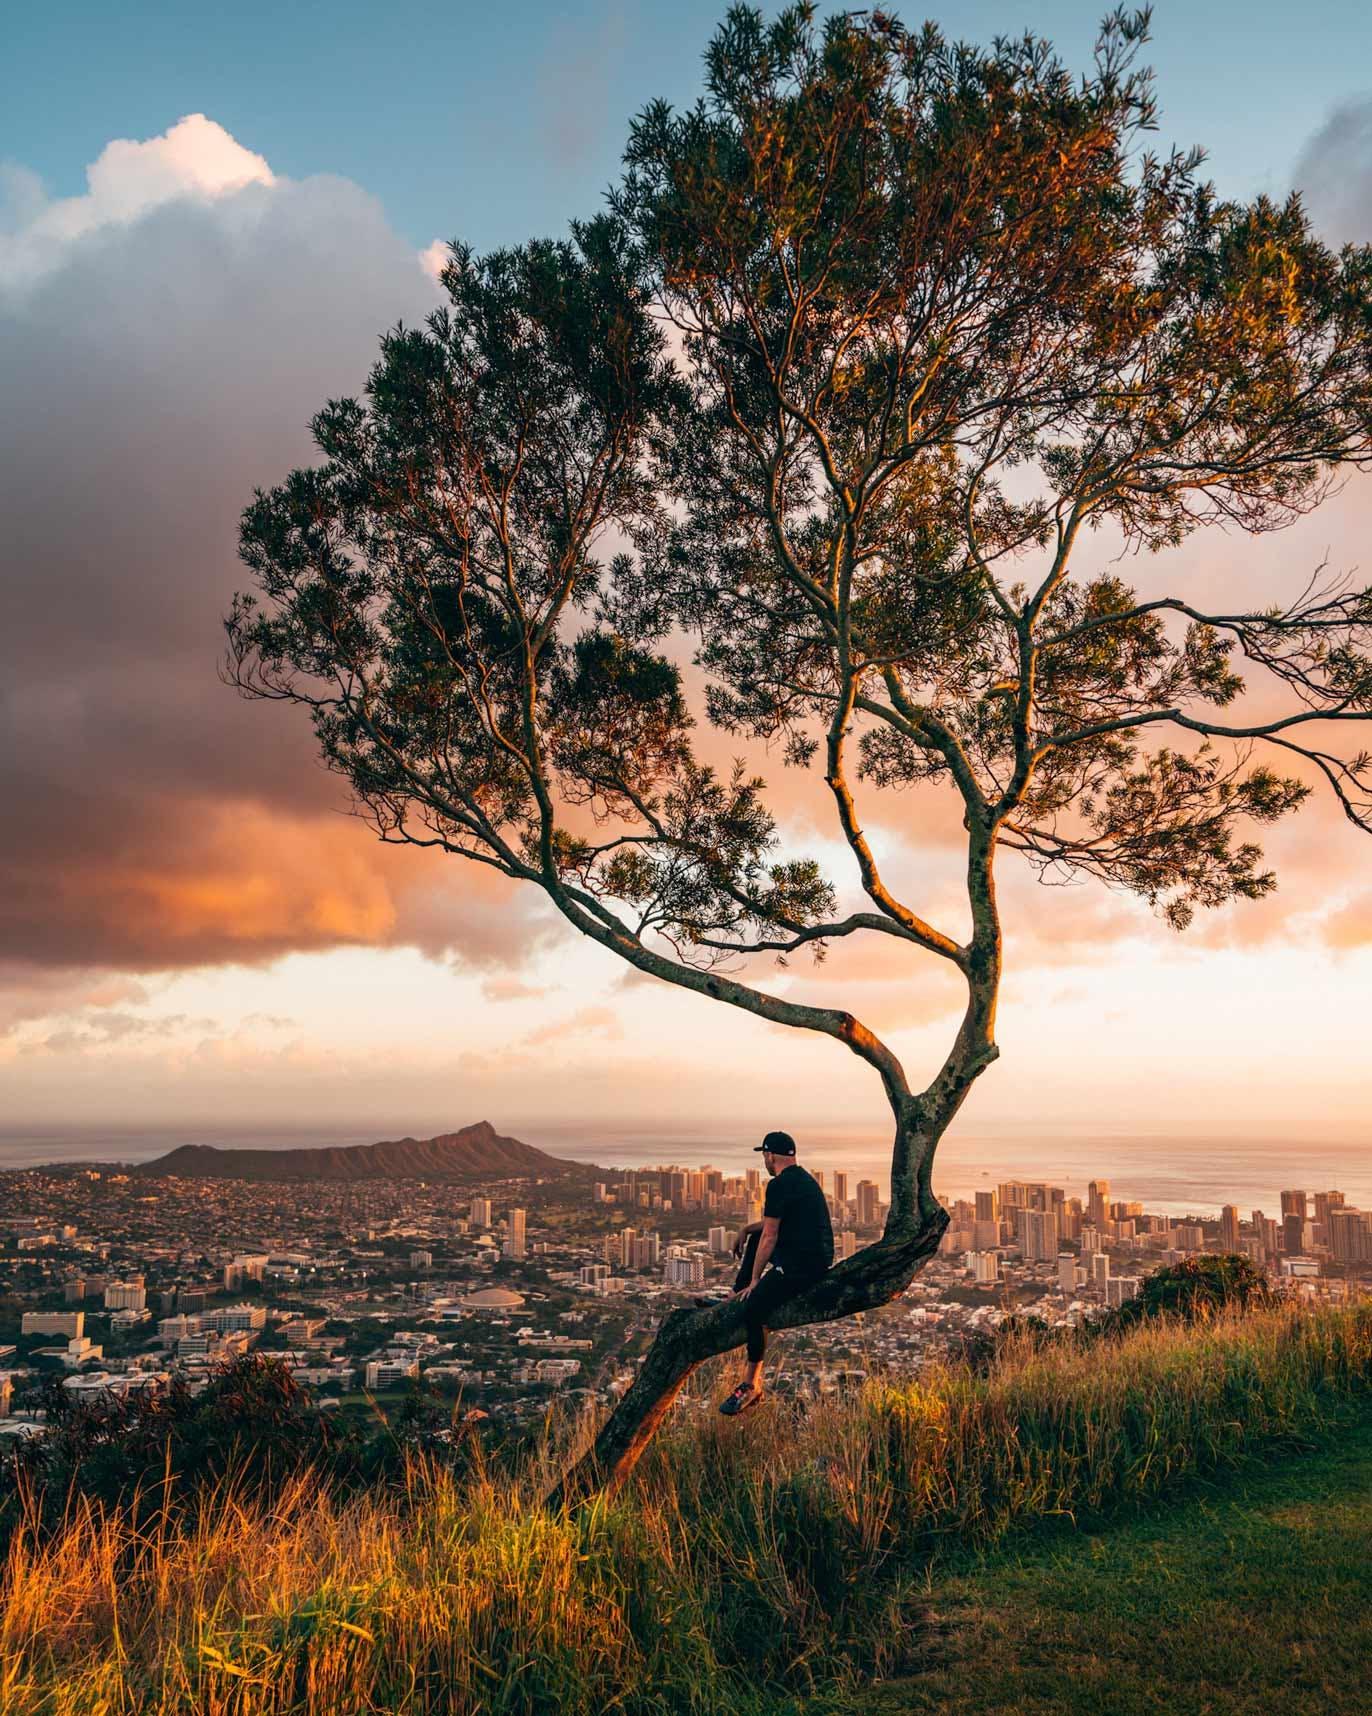 Tantalus Lookout Tree view of Diamond Head & Downtown Honolulu